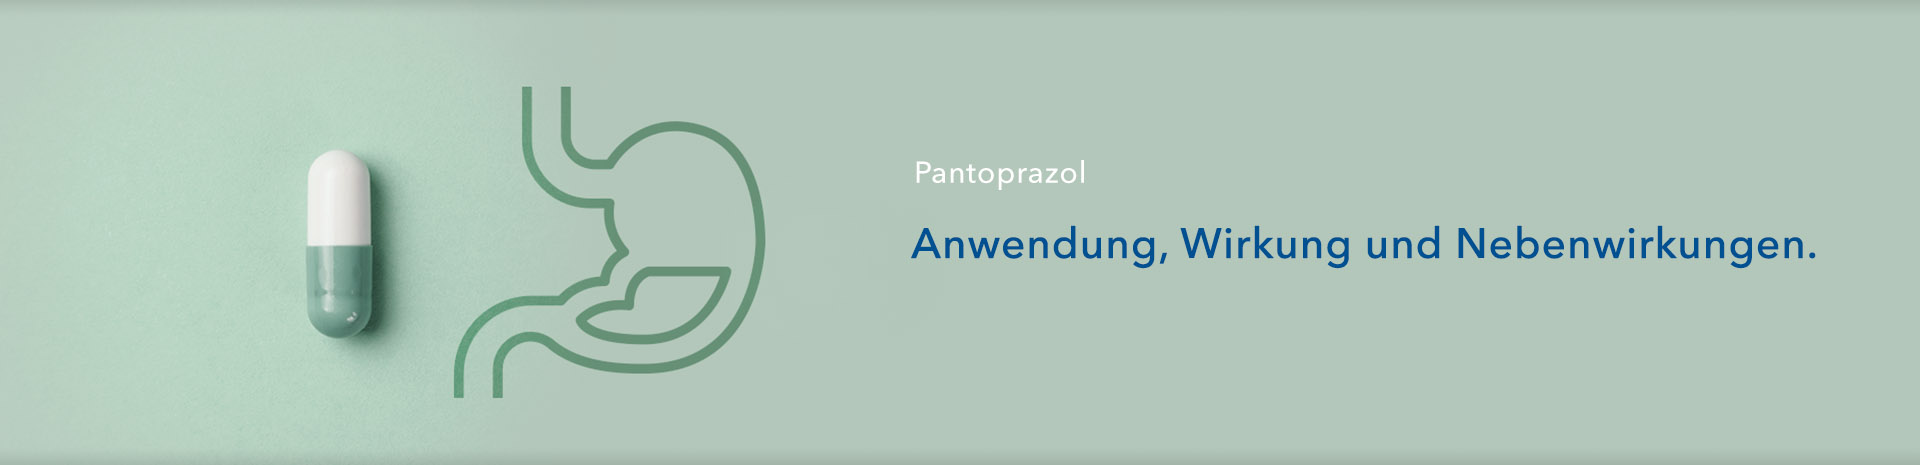 Ratgeber zu Pantoprazol